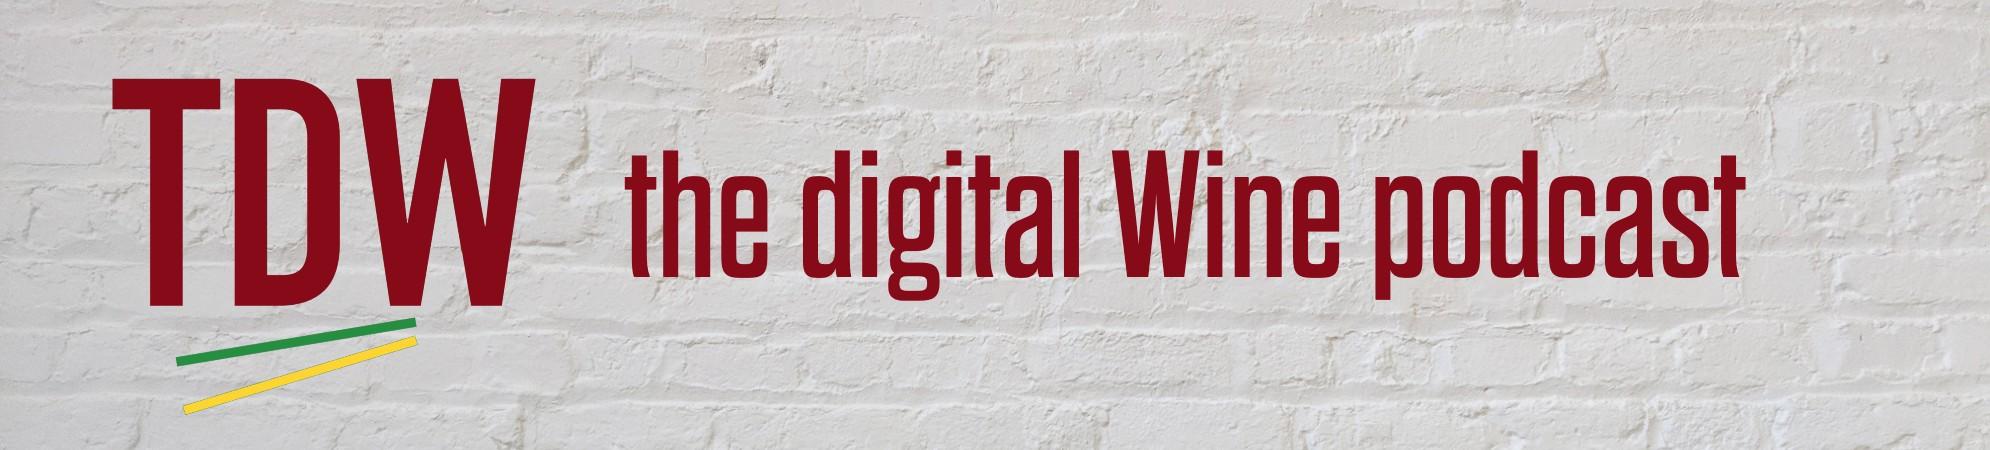 podcast the digital wine